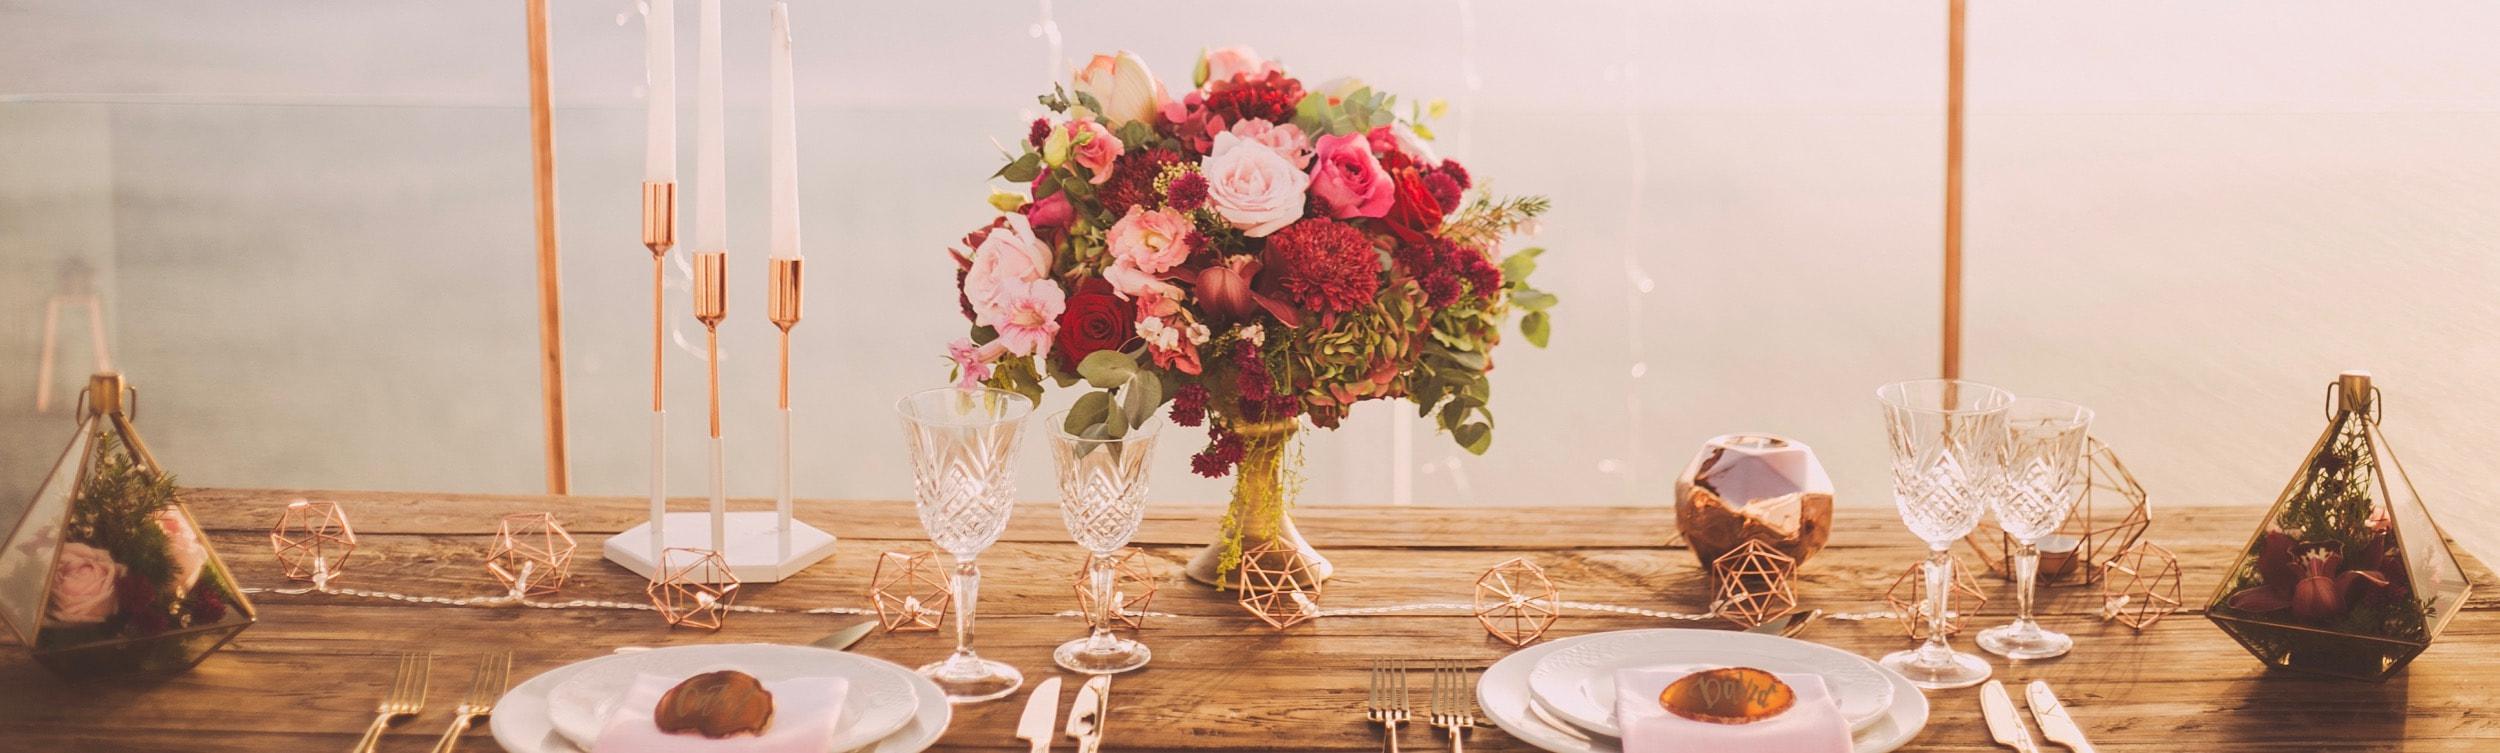 Tischdeko Hochzeitsdeko DIY